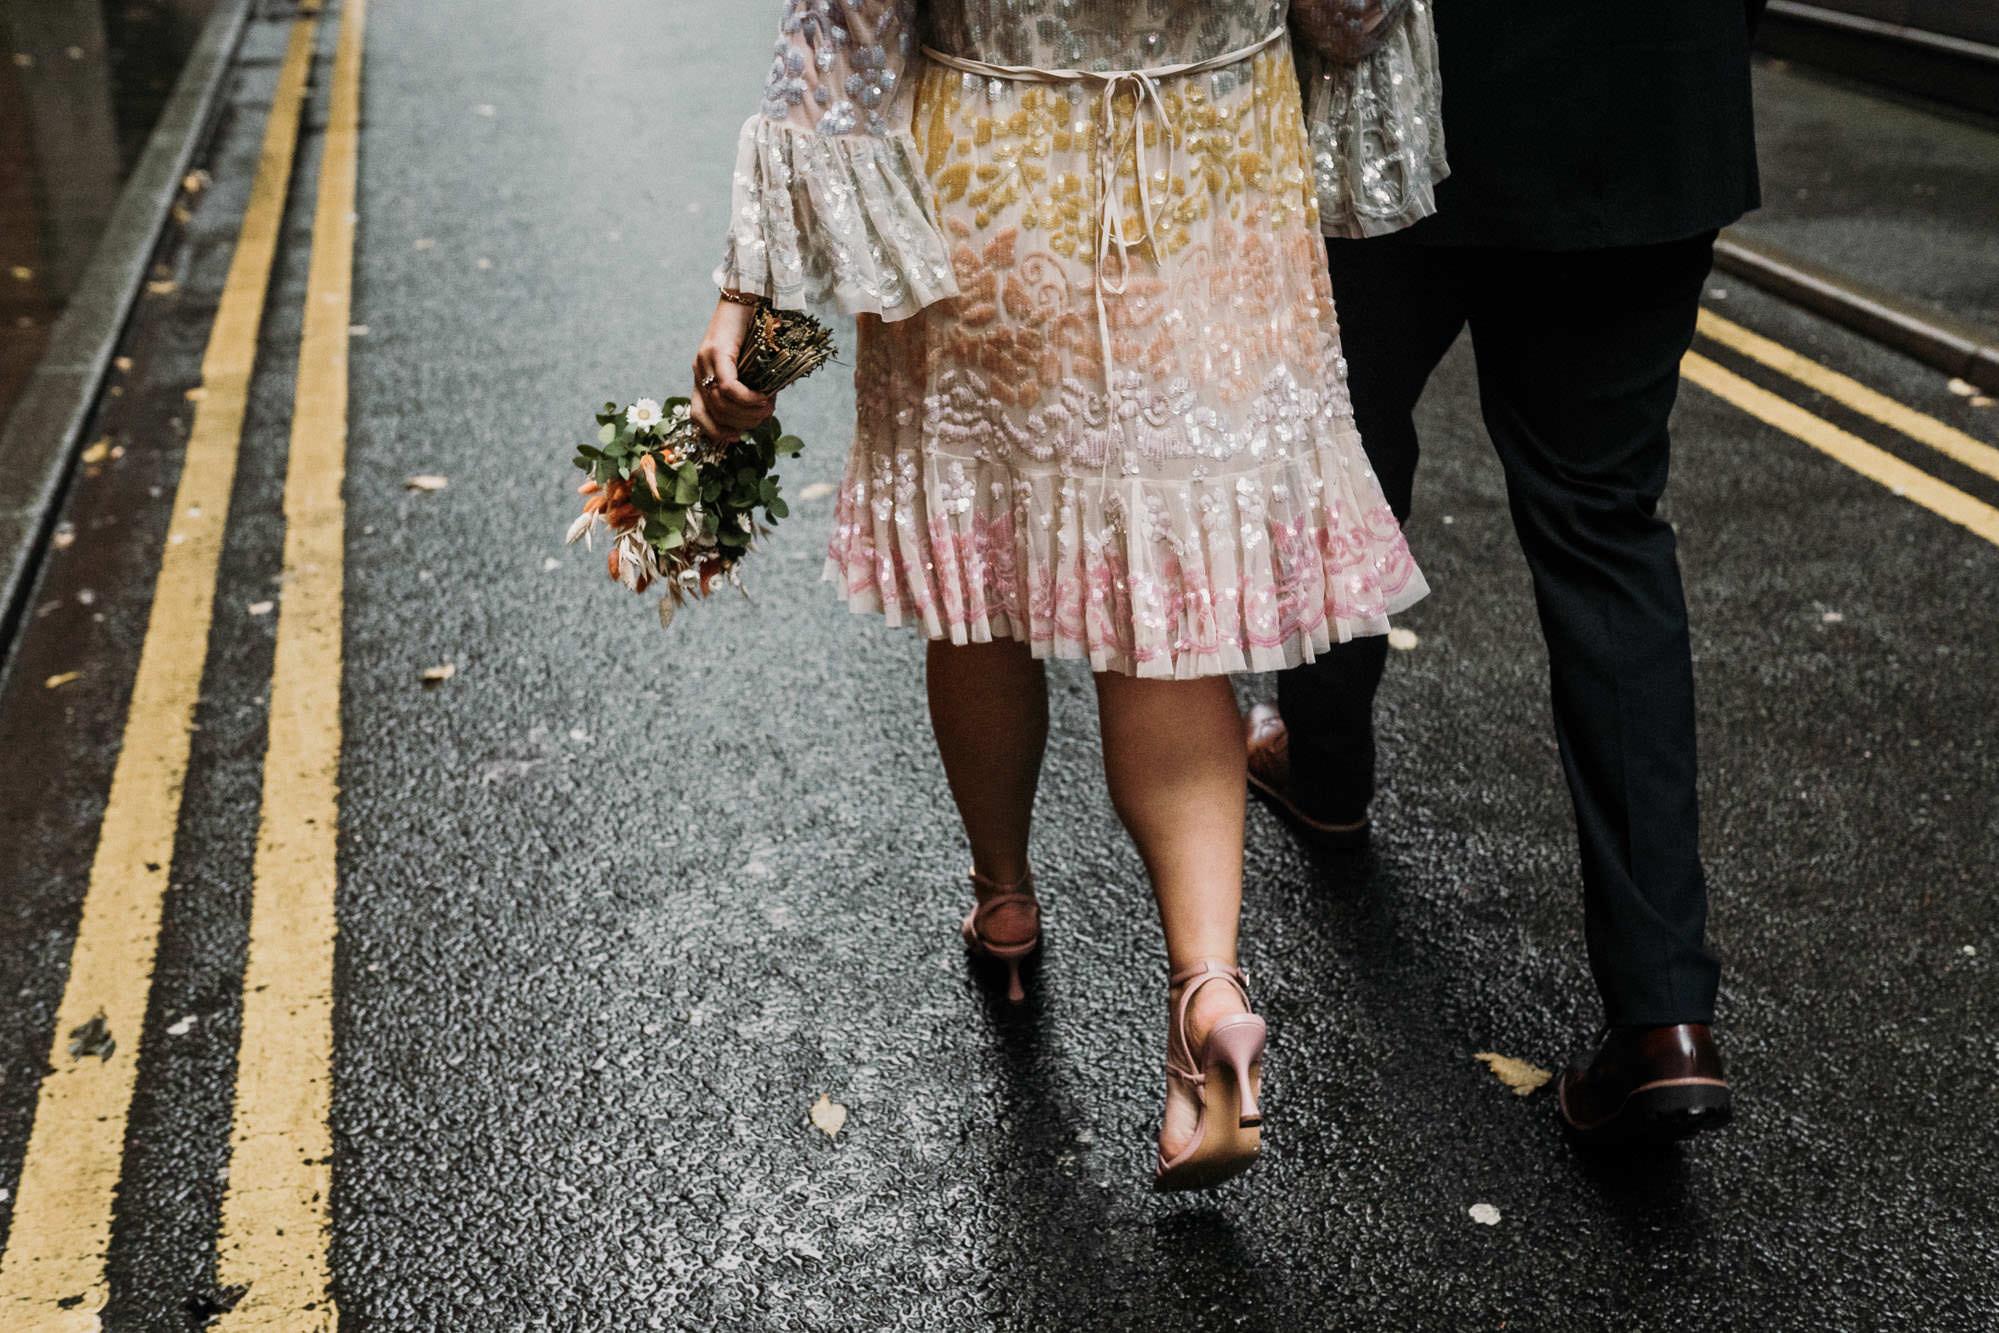 Clara Cooper Photography - Colourful, fun wedding photography